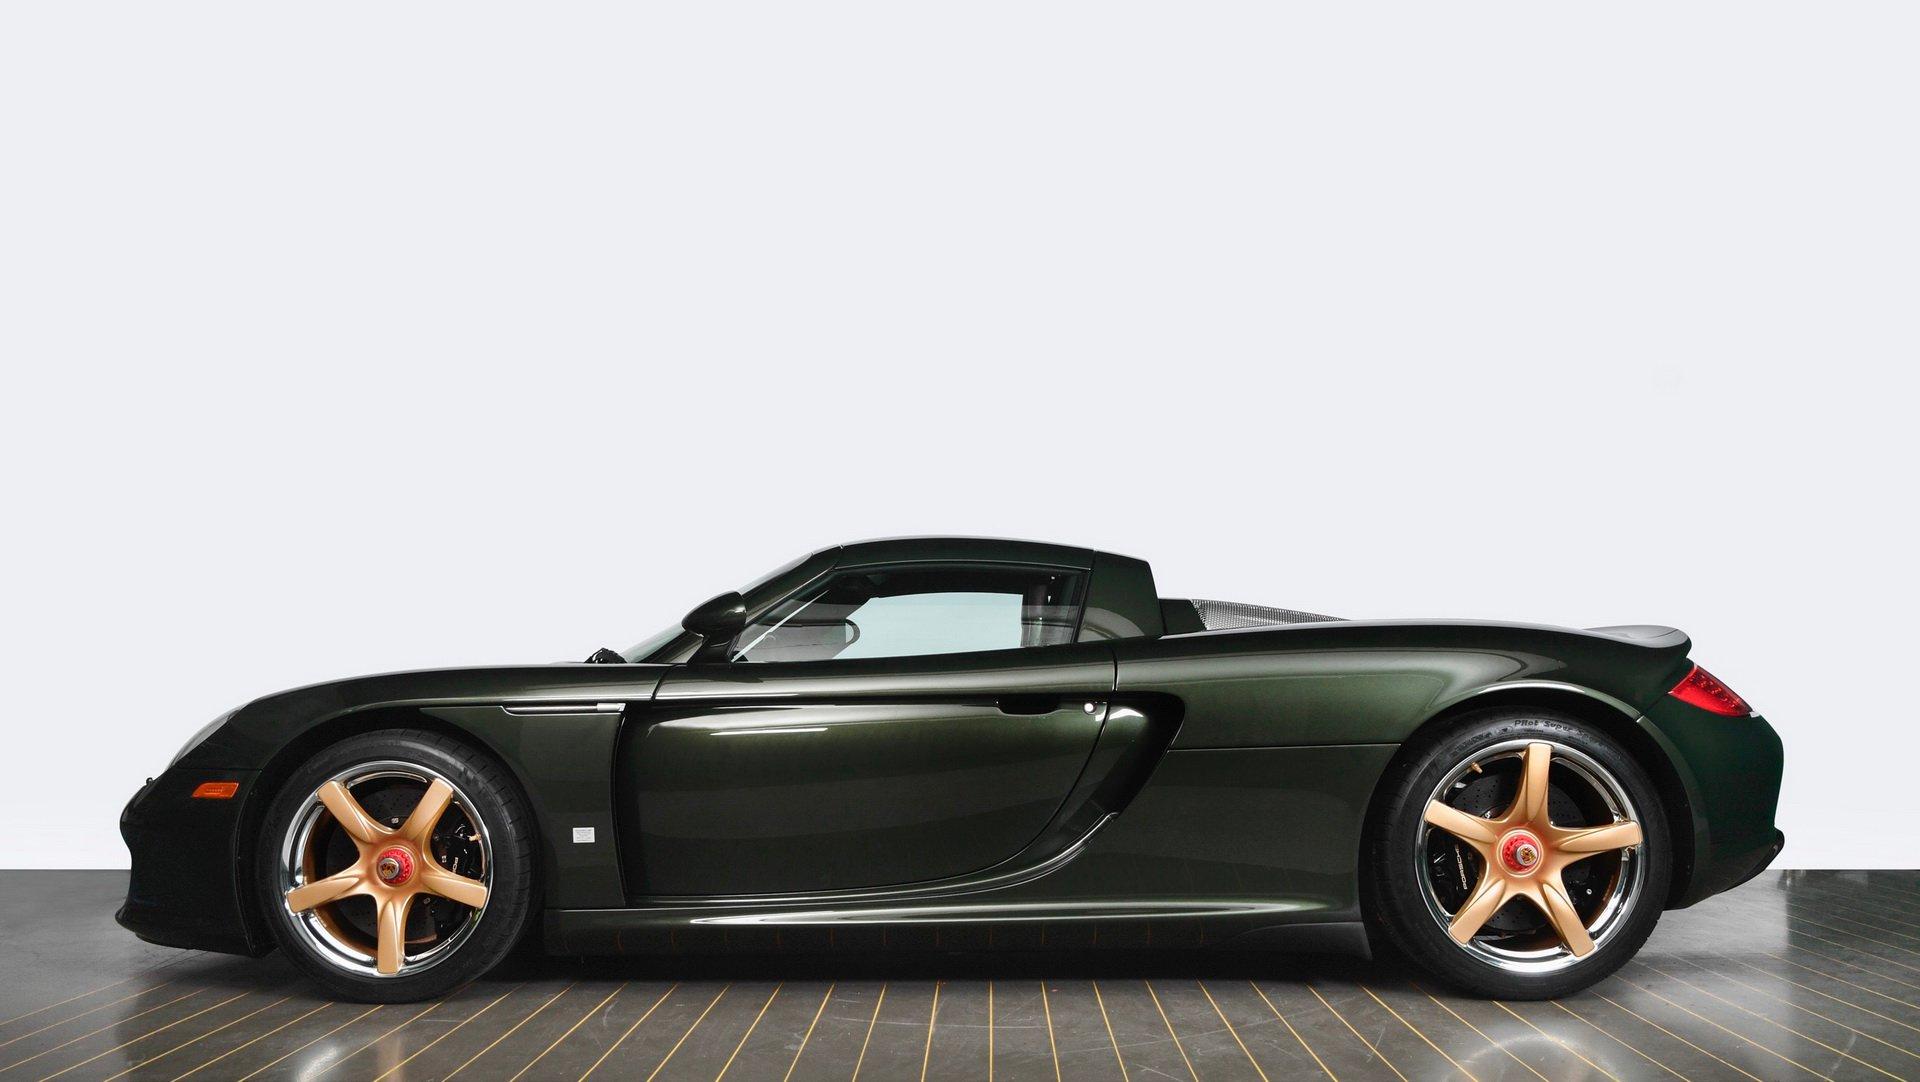 Porsche отреставрировала спорткар Carrera GT по заказу клиента 1